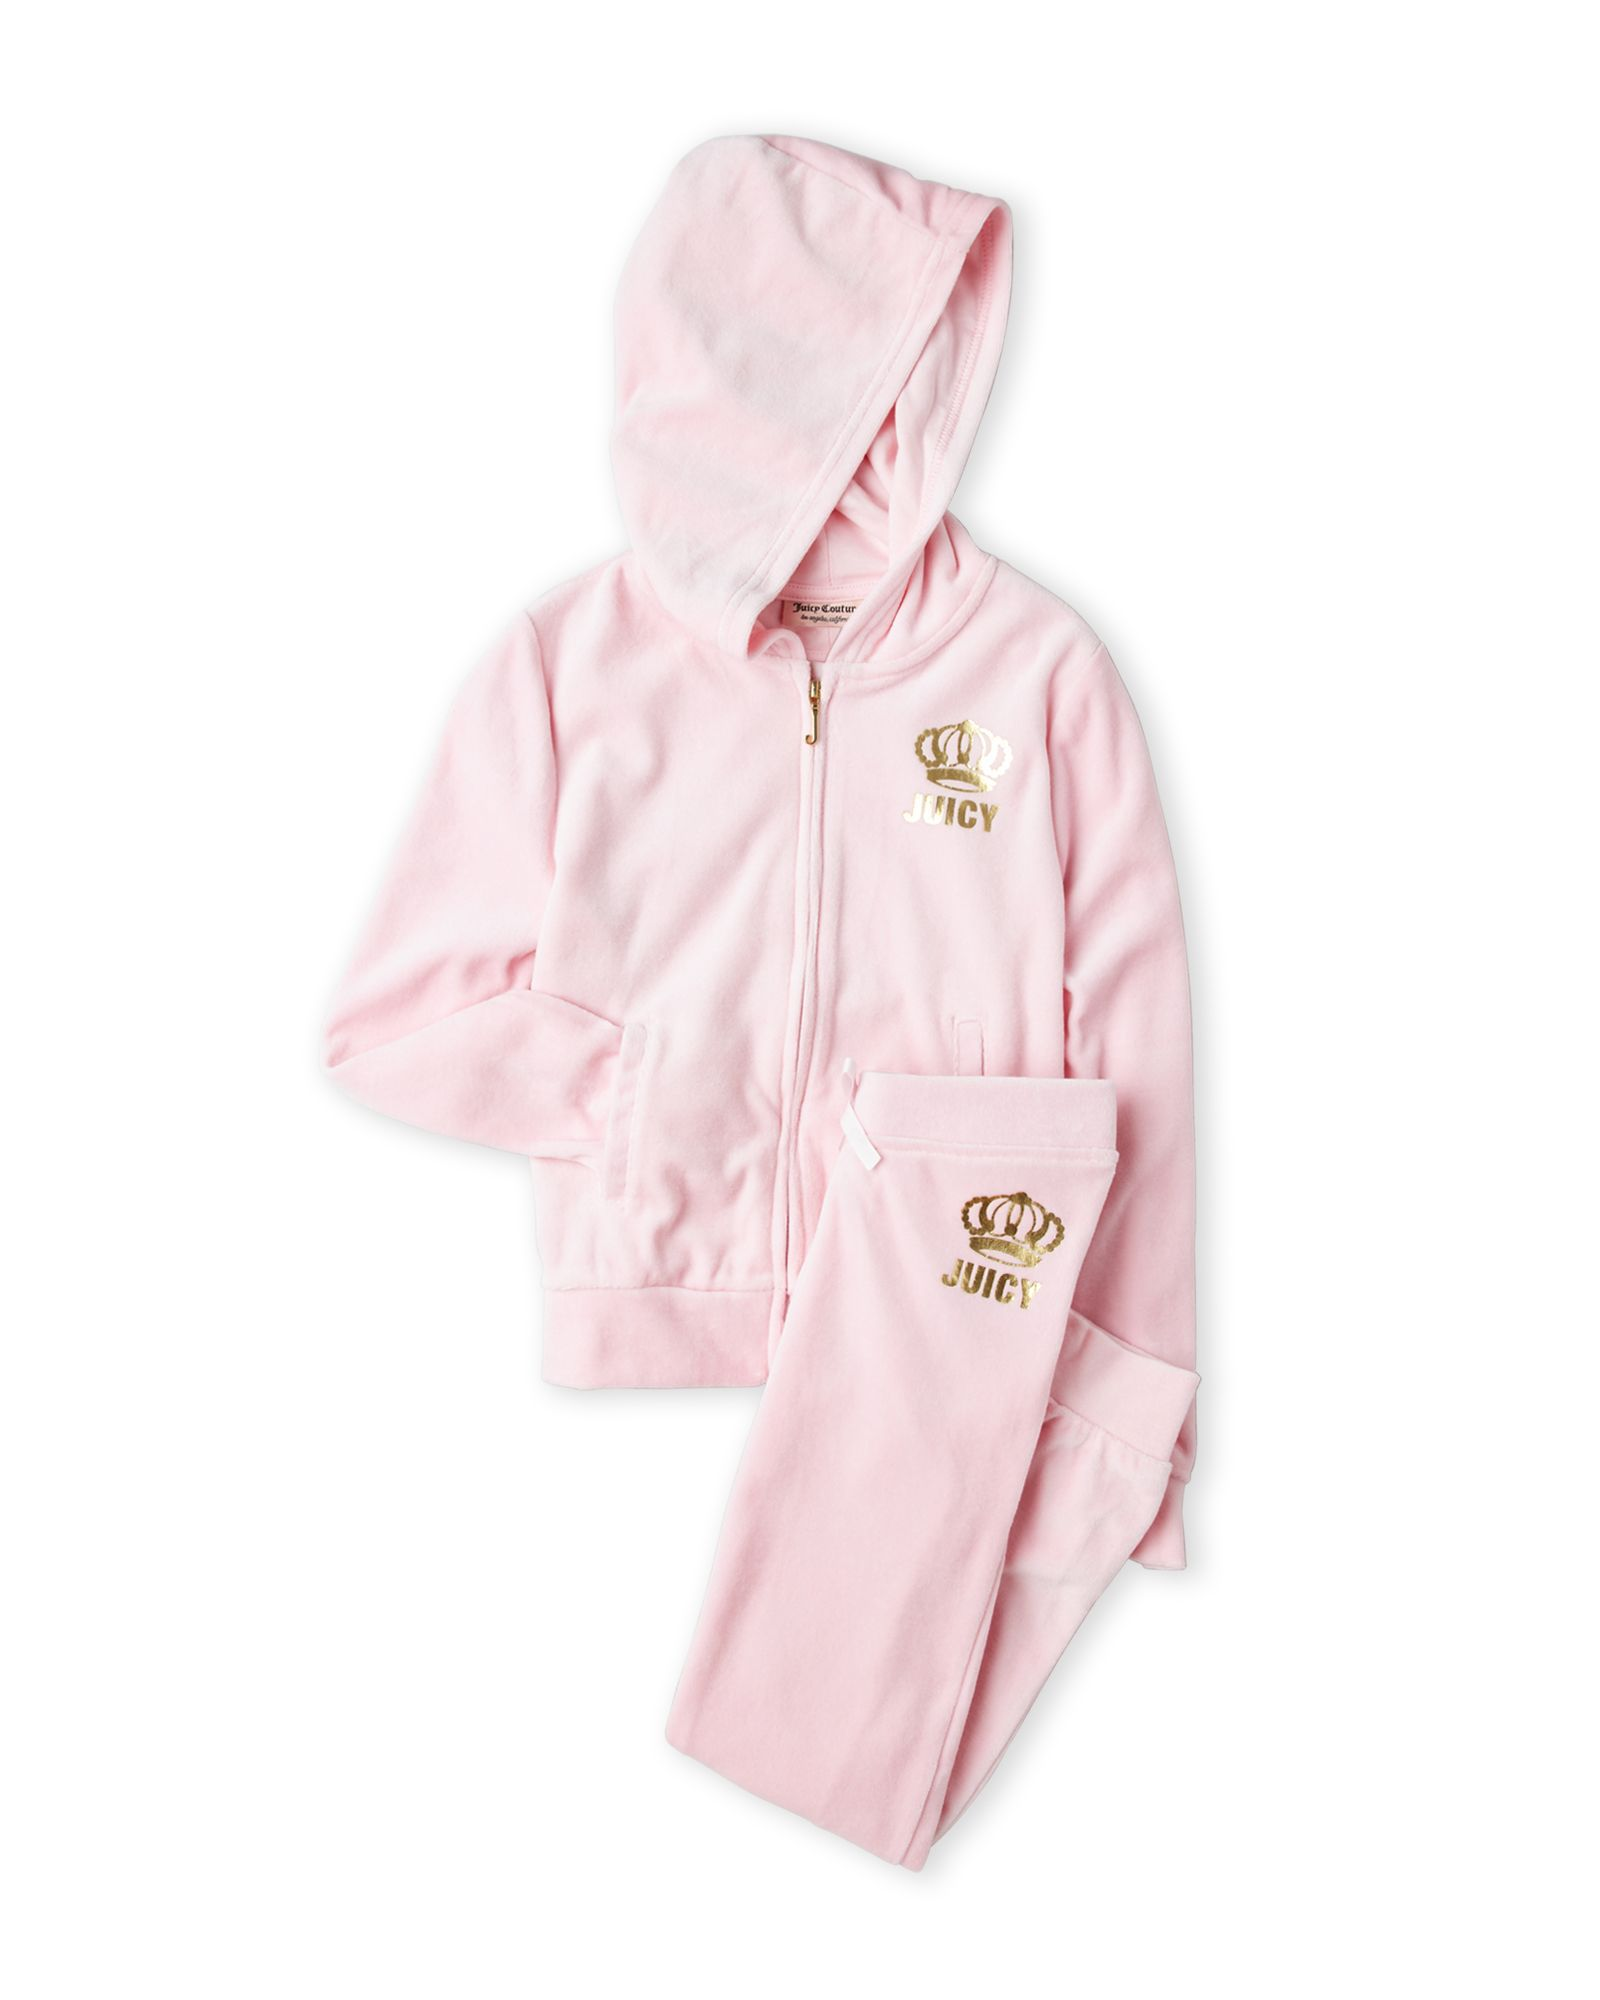 f80210fb2 Girls 4-6x) Two-Piece Velour Sweatsuit | *Apparel & Accessories ...